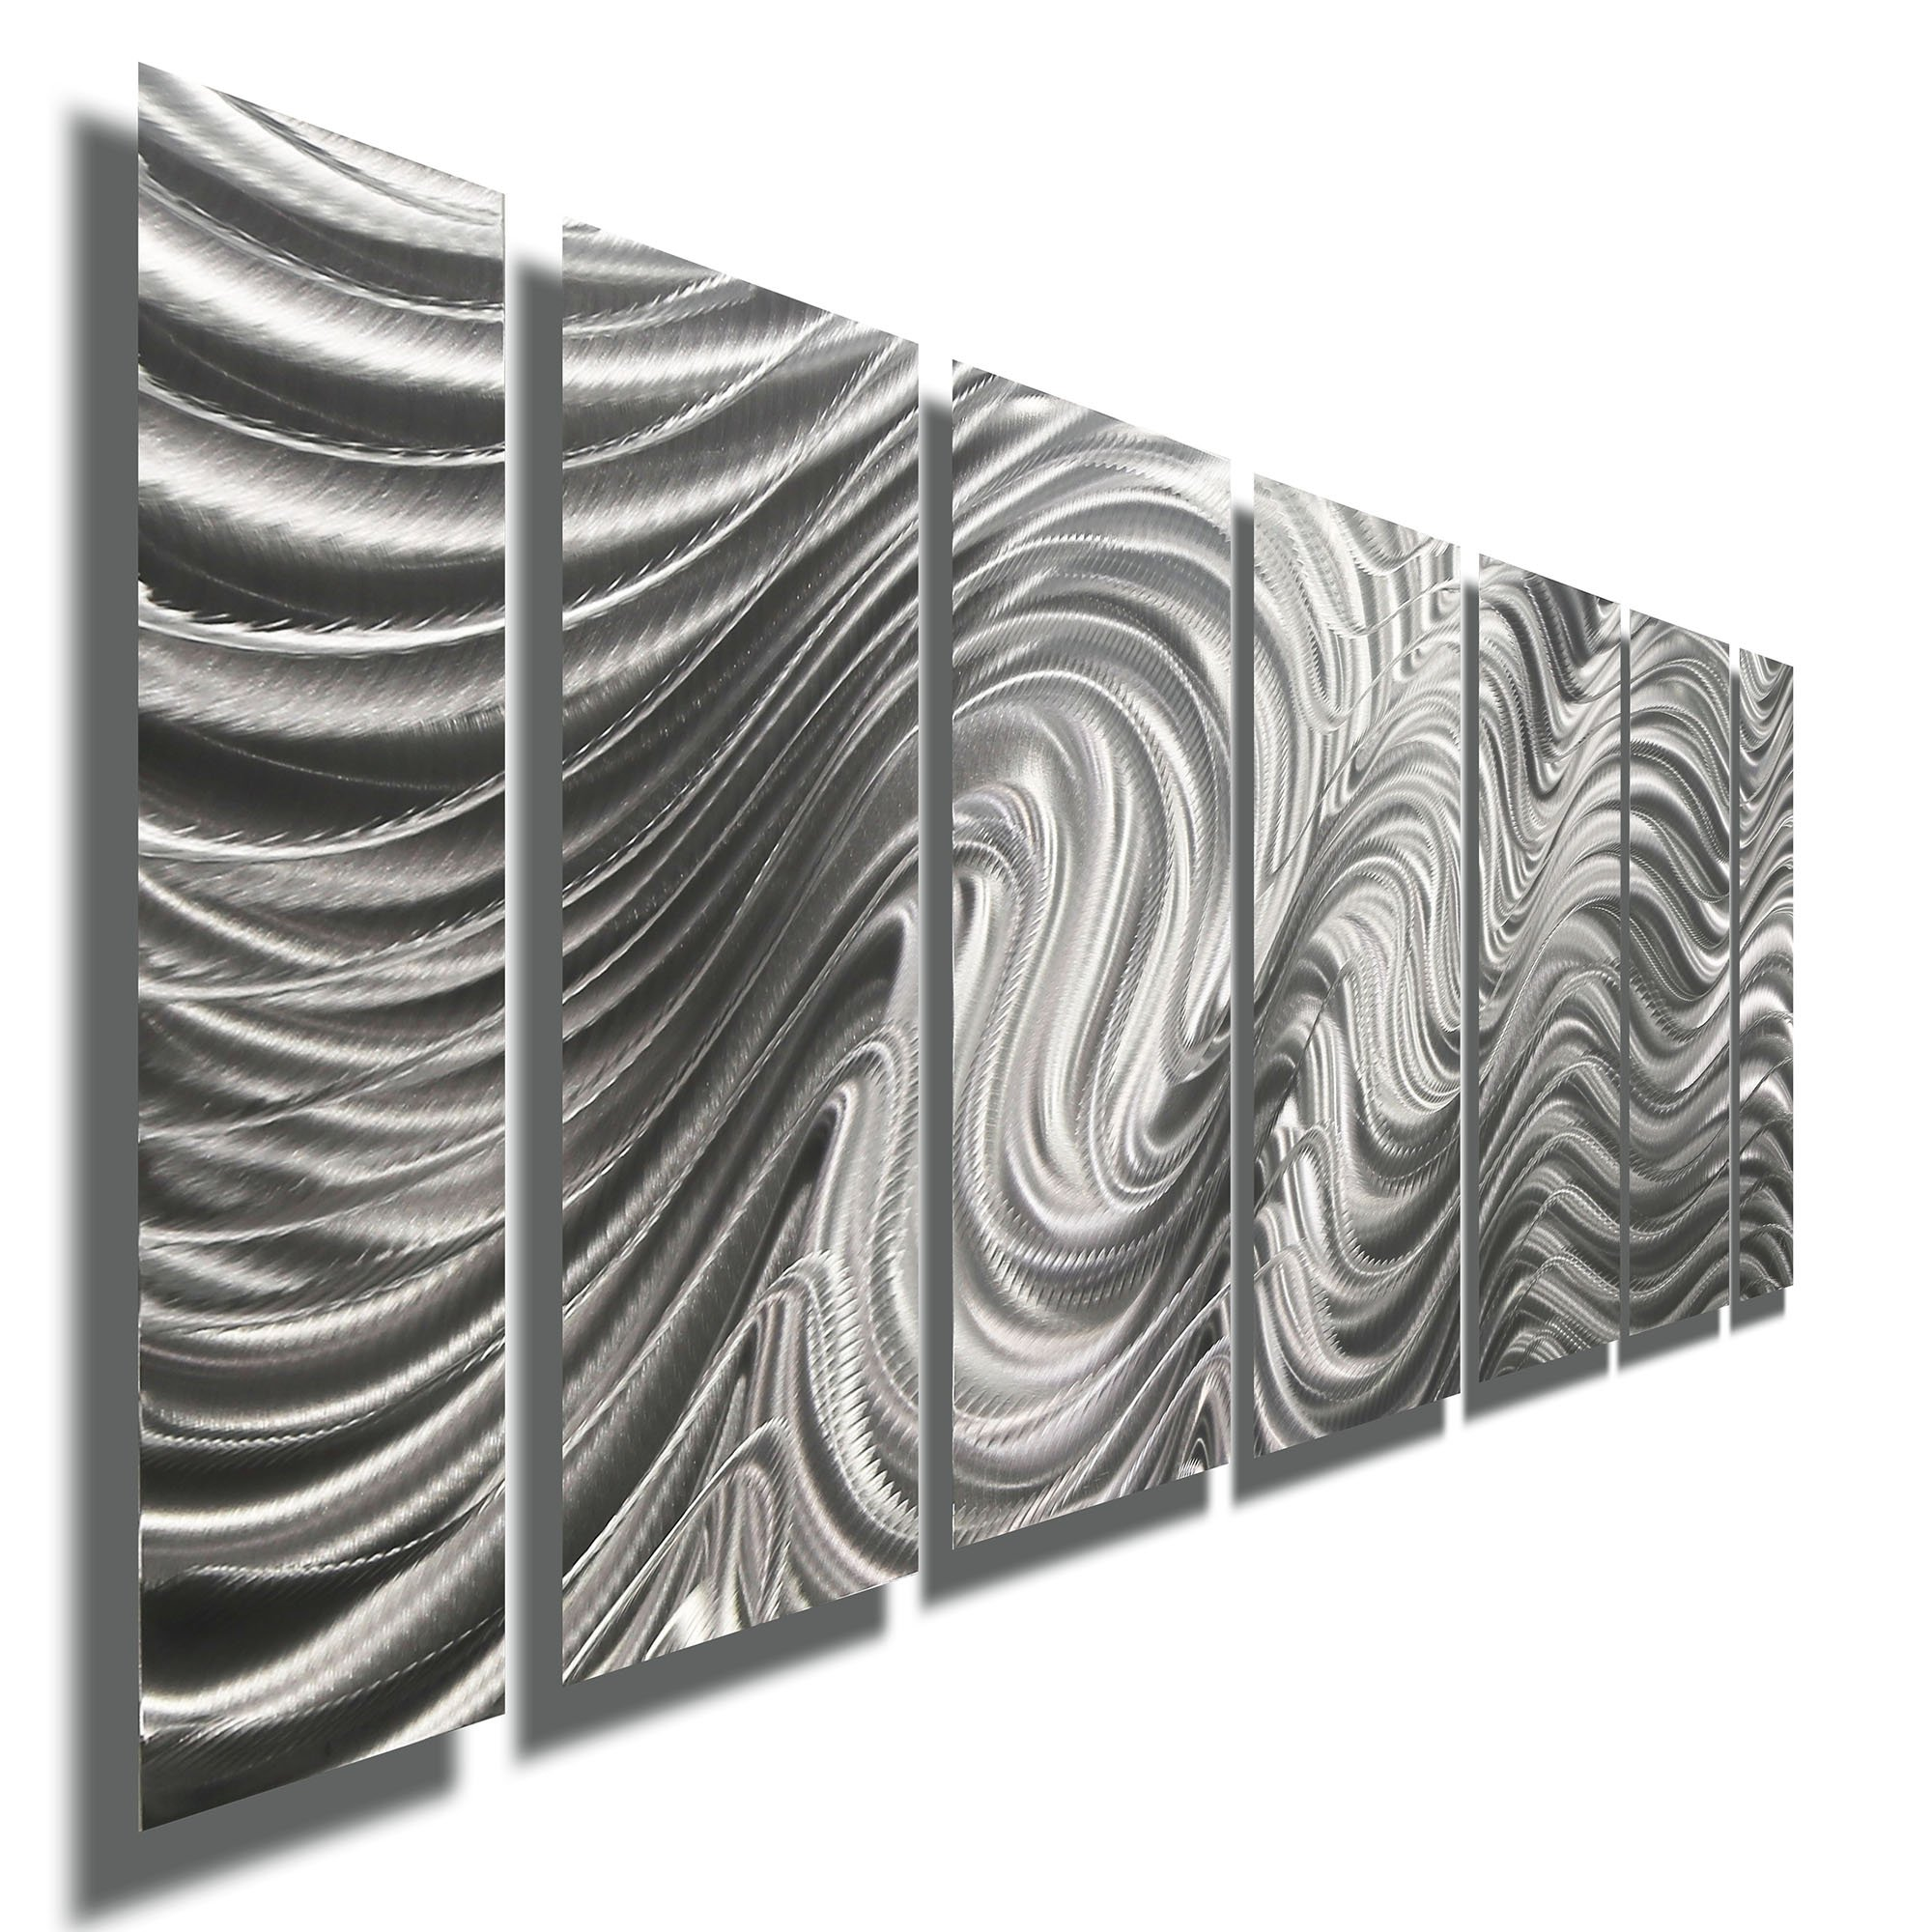 Silver Contemporary Metal Wall Art Sculpture - Multi Panel Metal Decor by Jon Allen - Hypnotic Sands